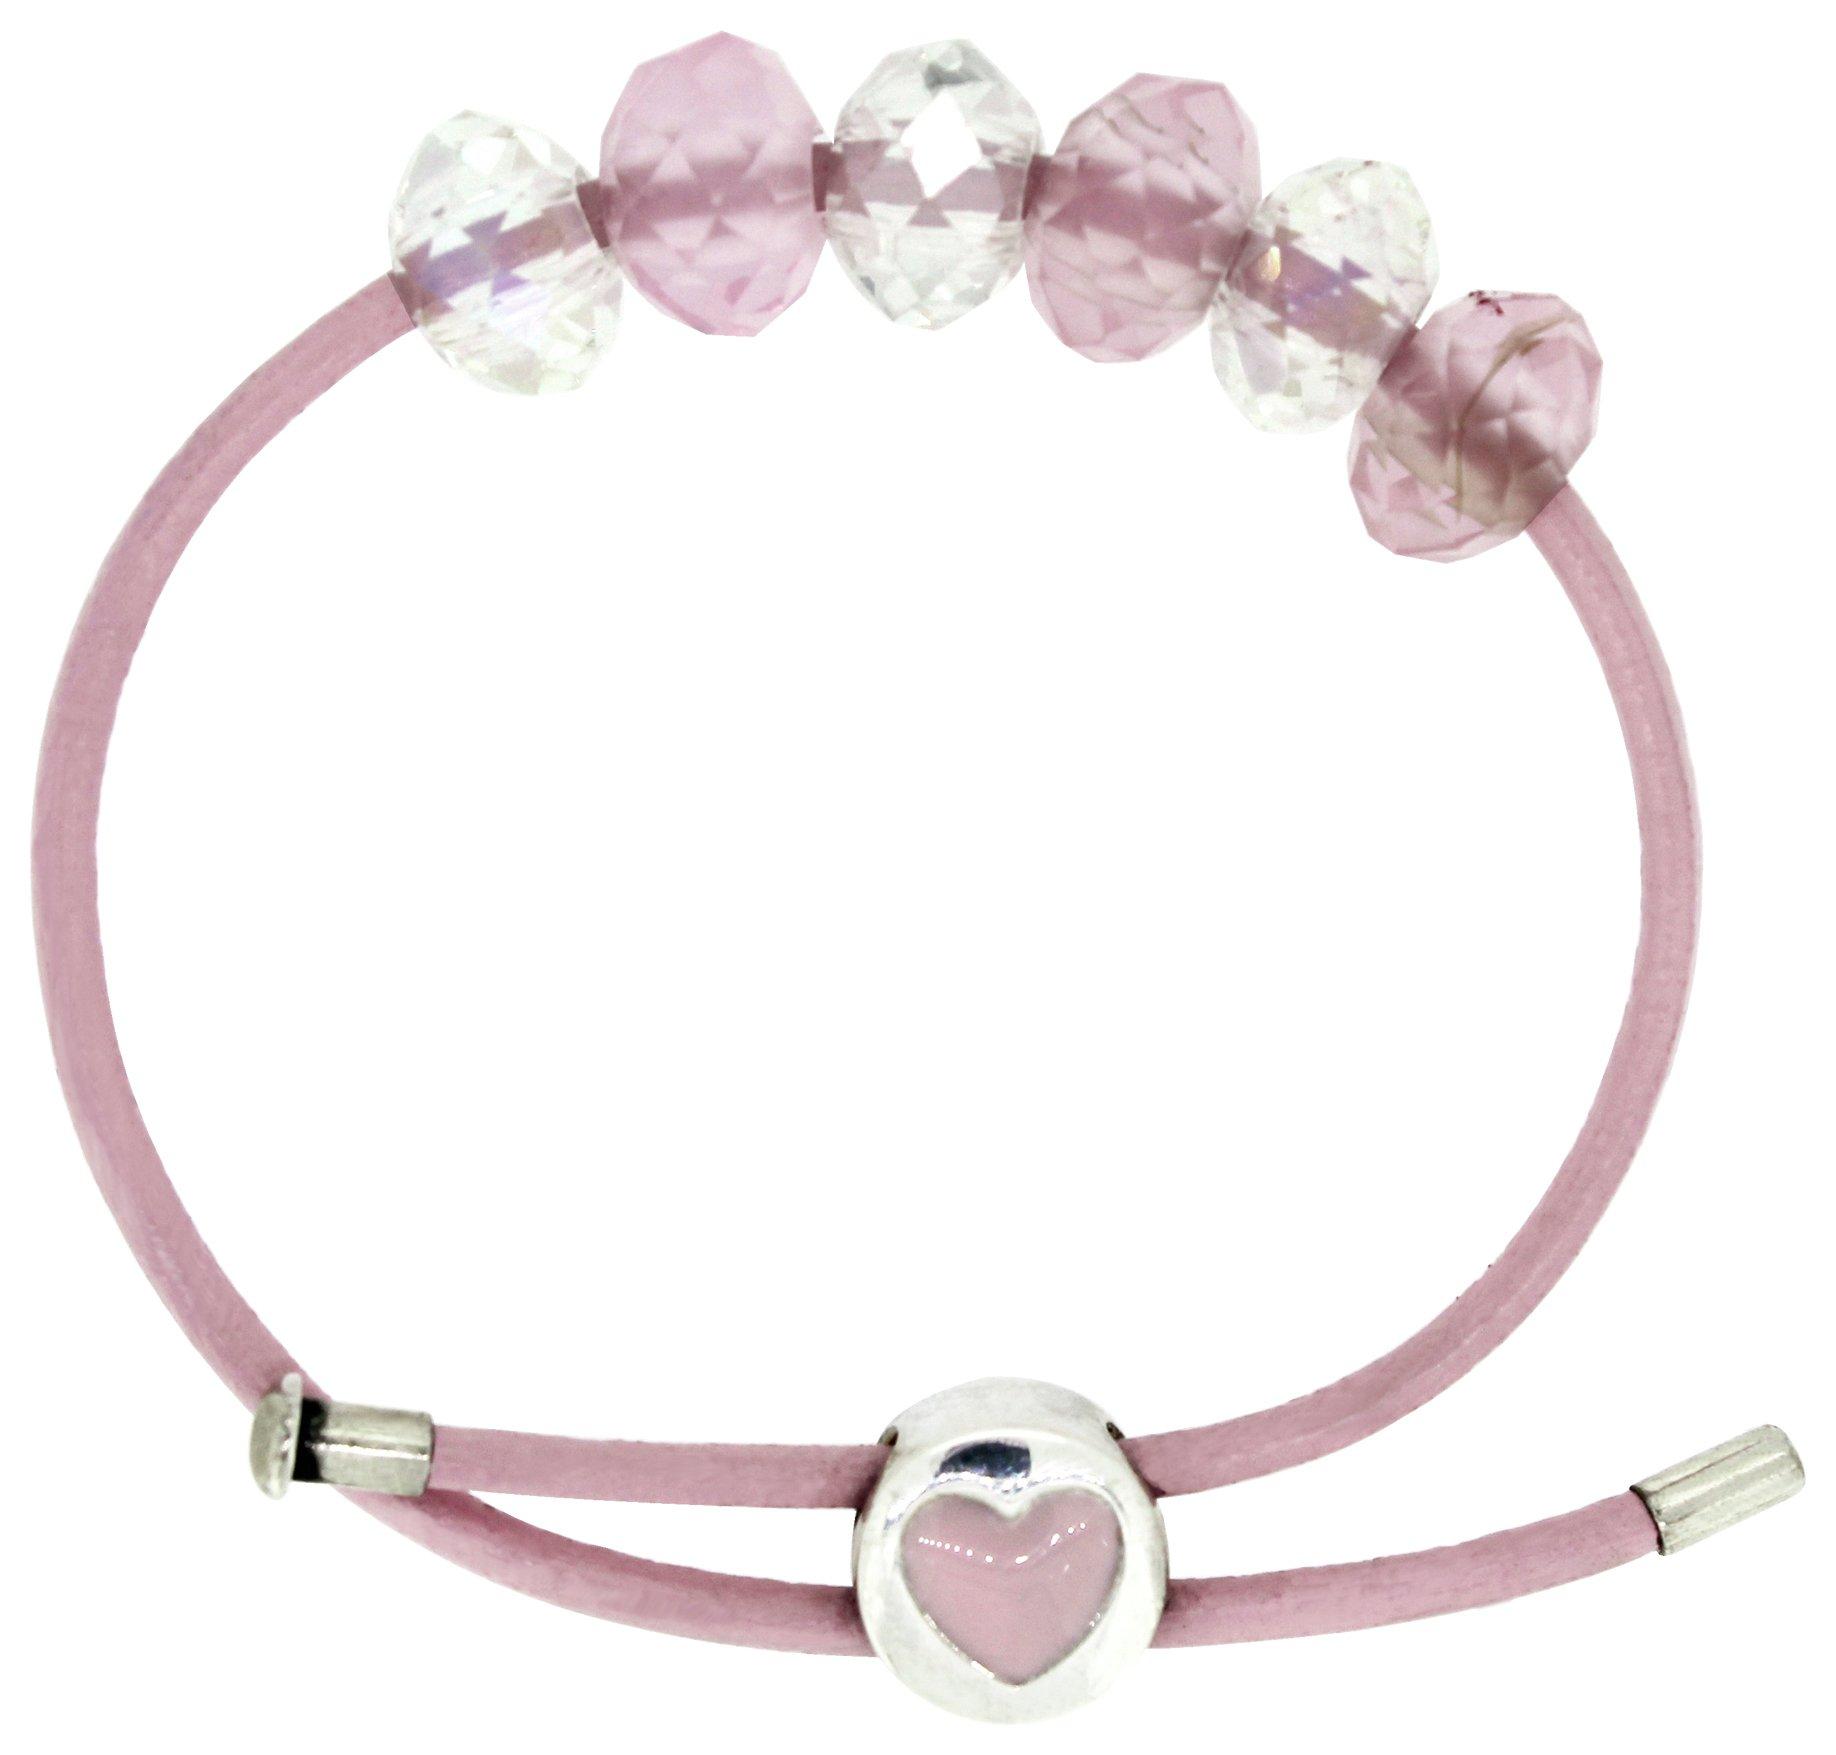 Miss Glitter S.Silver Kids Heart Clasp Made Up Pink Bracelet